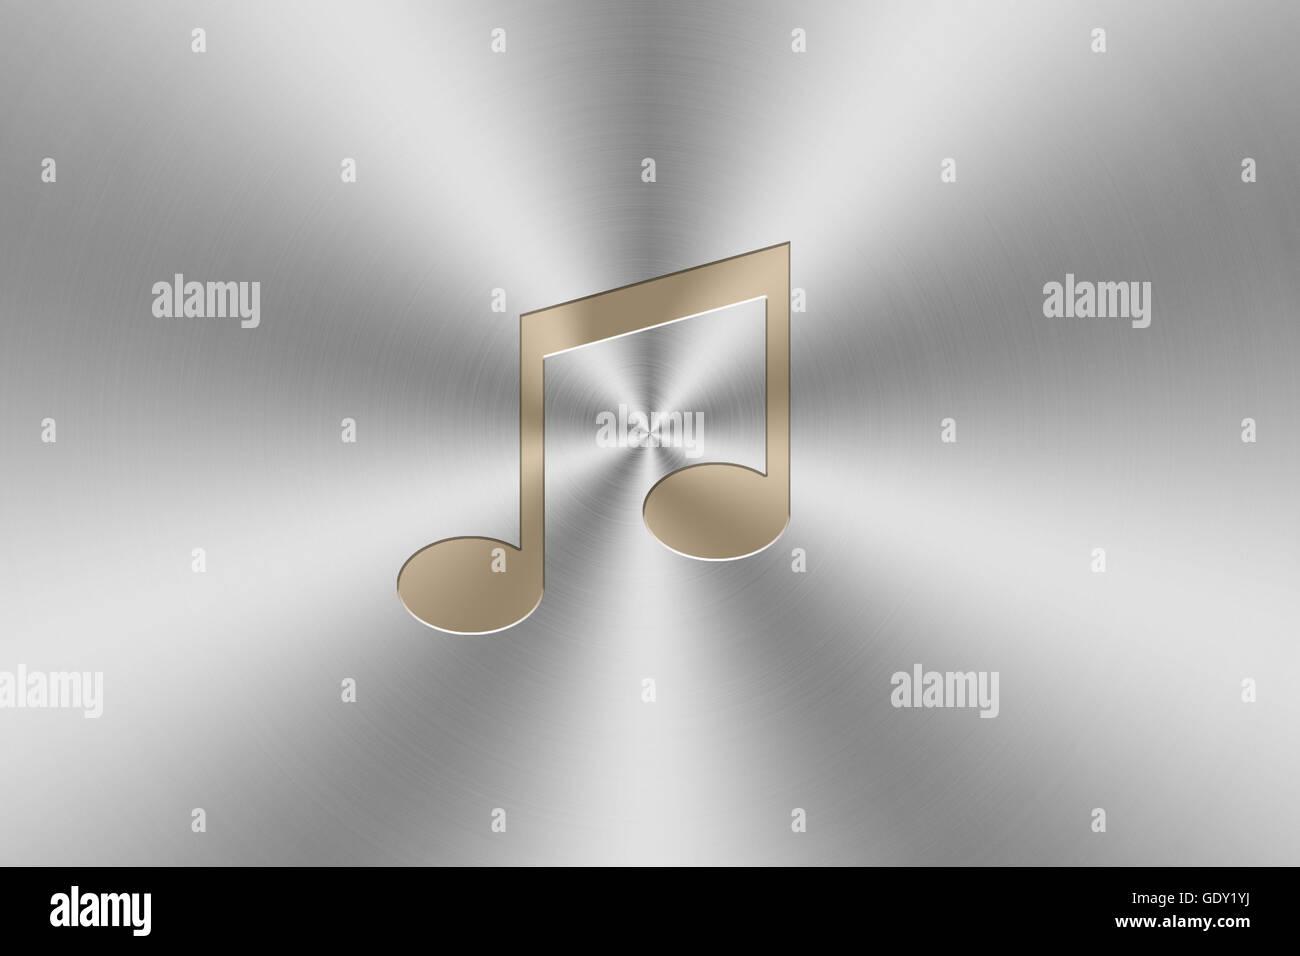 golden note 5 icon inlay on chrome aluminum texture. Stock Photo